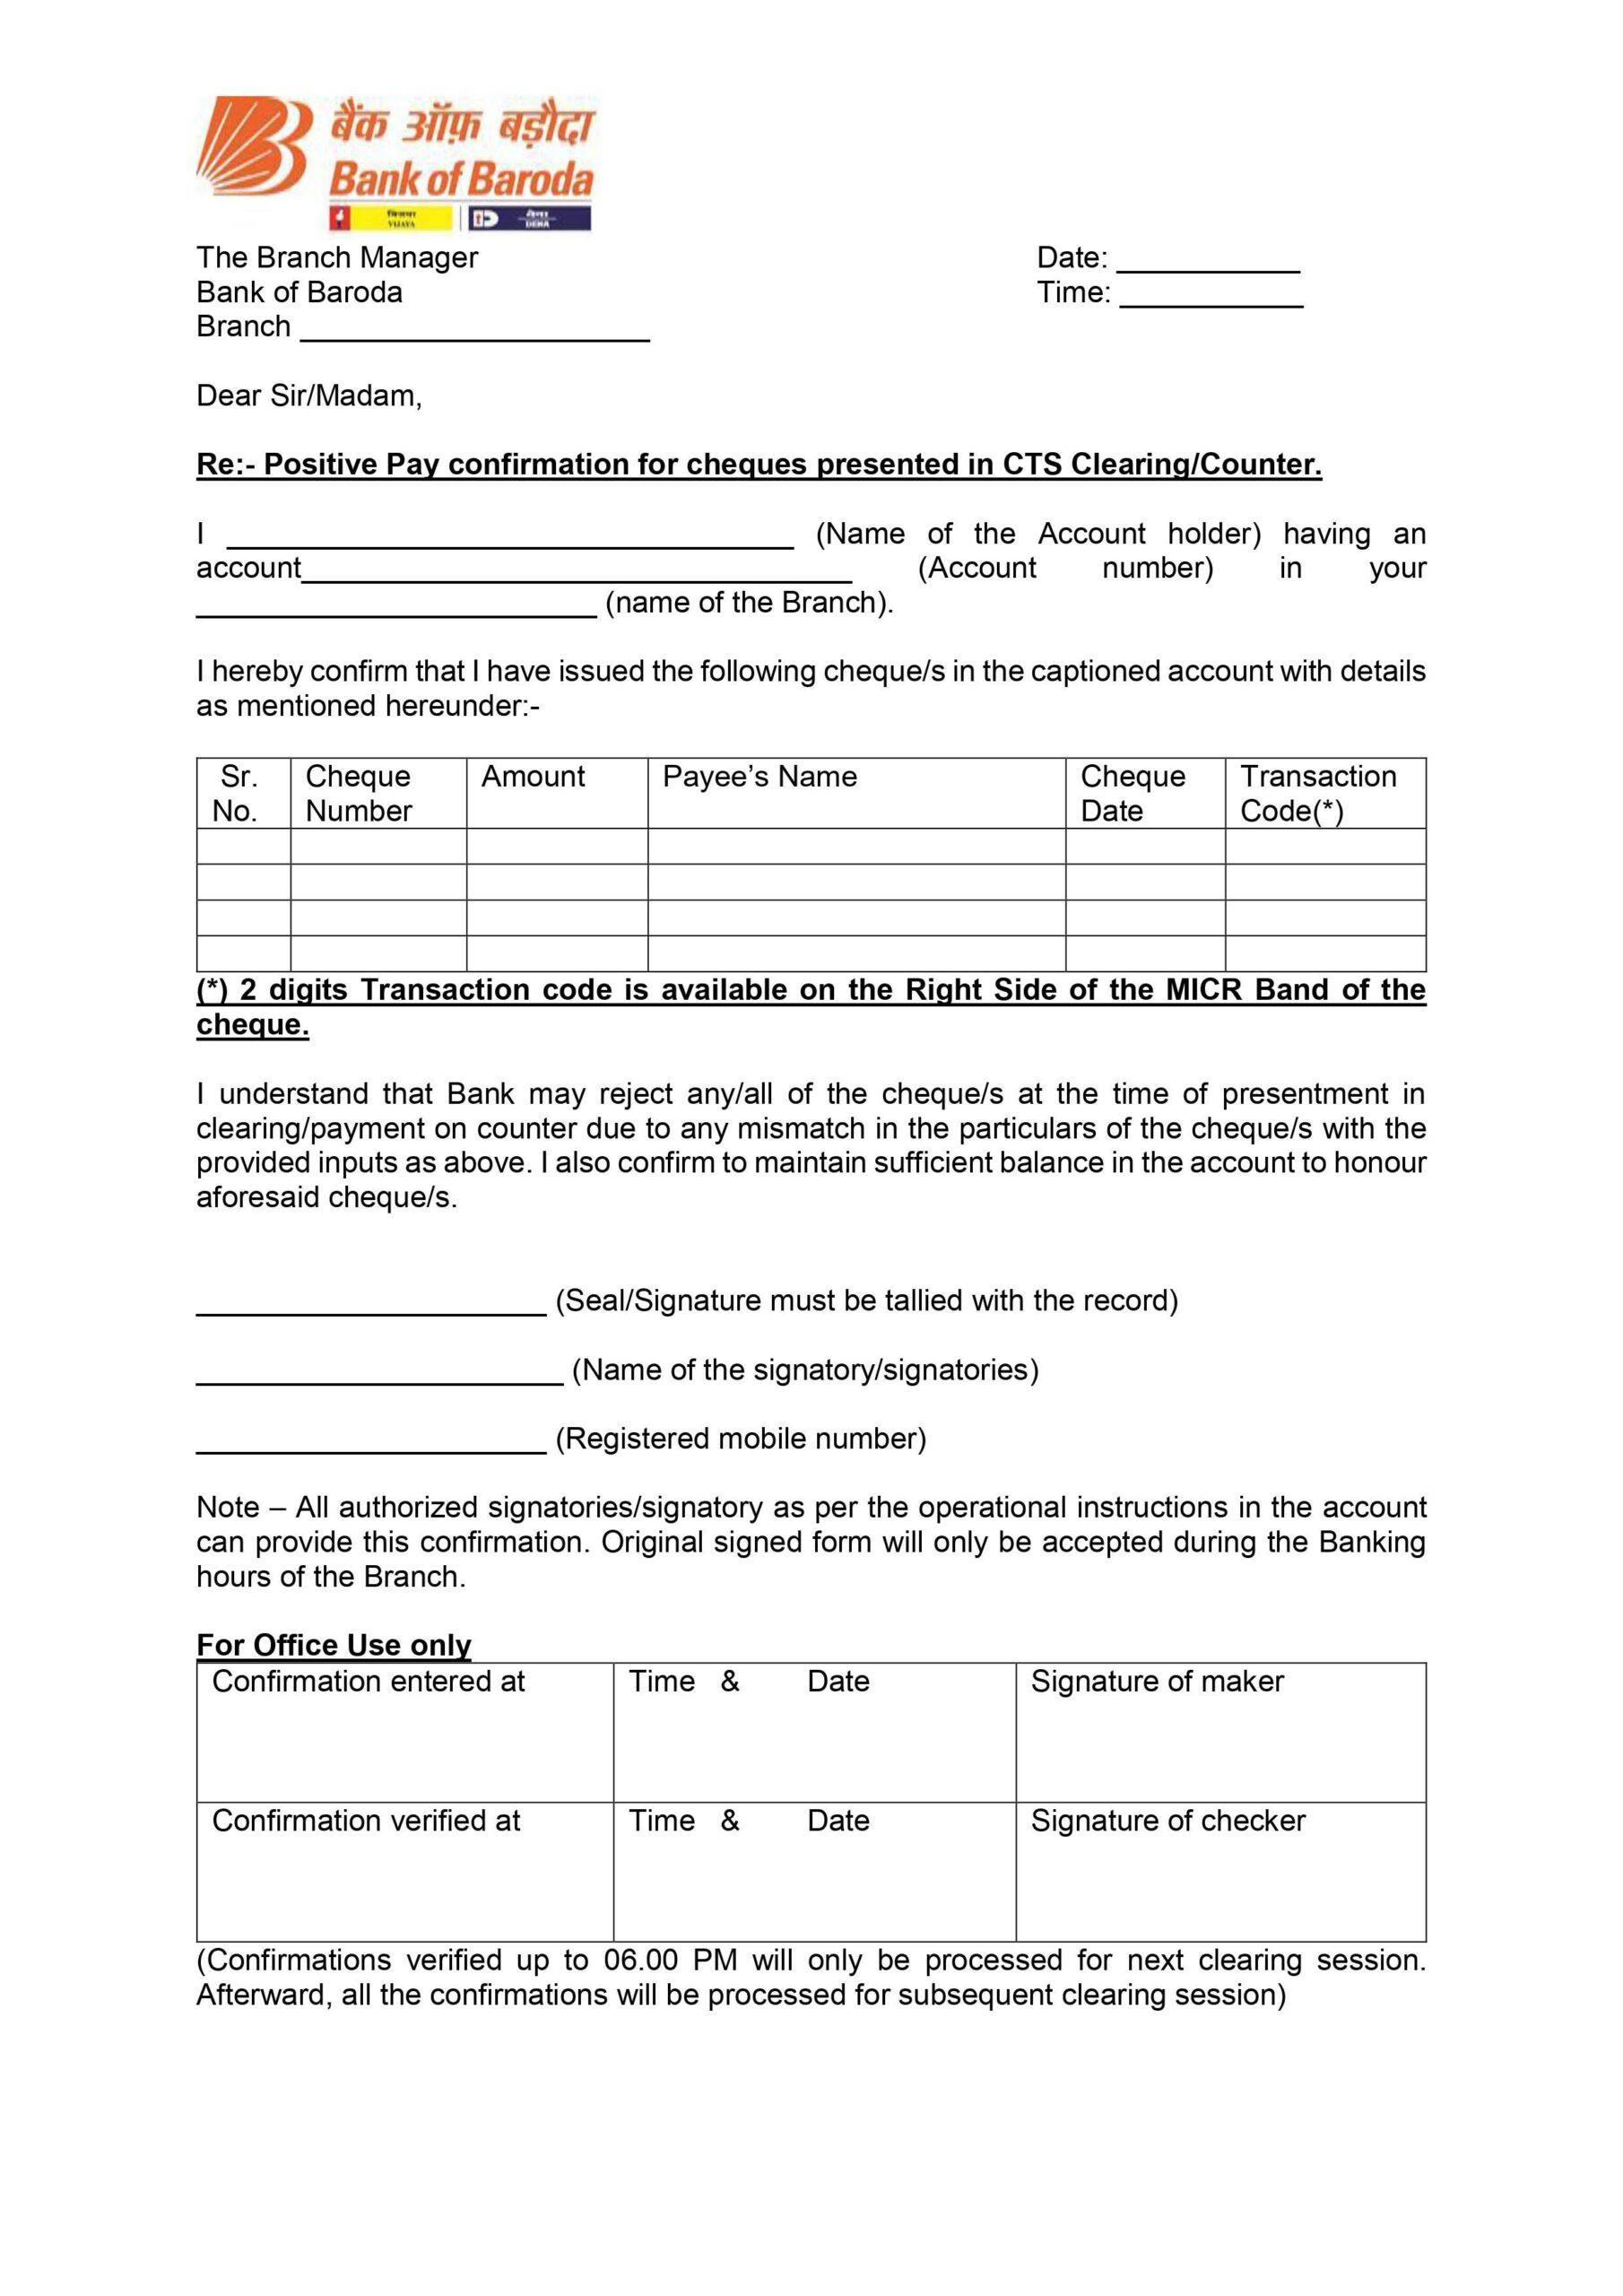 Download Positive Pay Application Form Bank of Baroda PDF